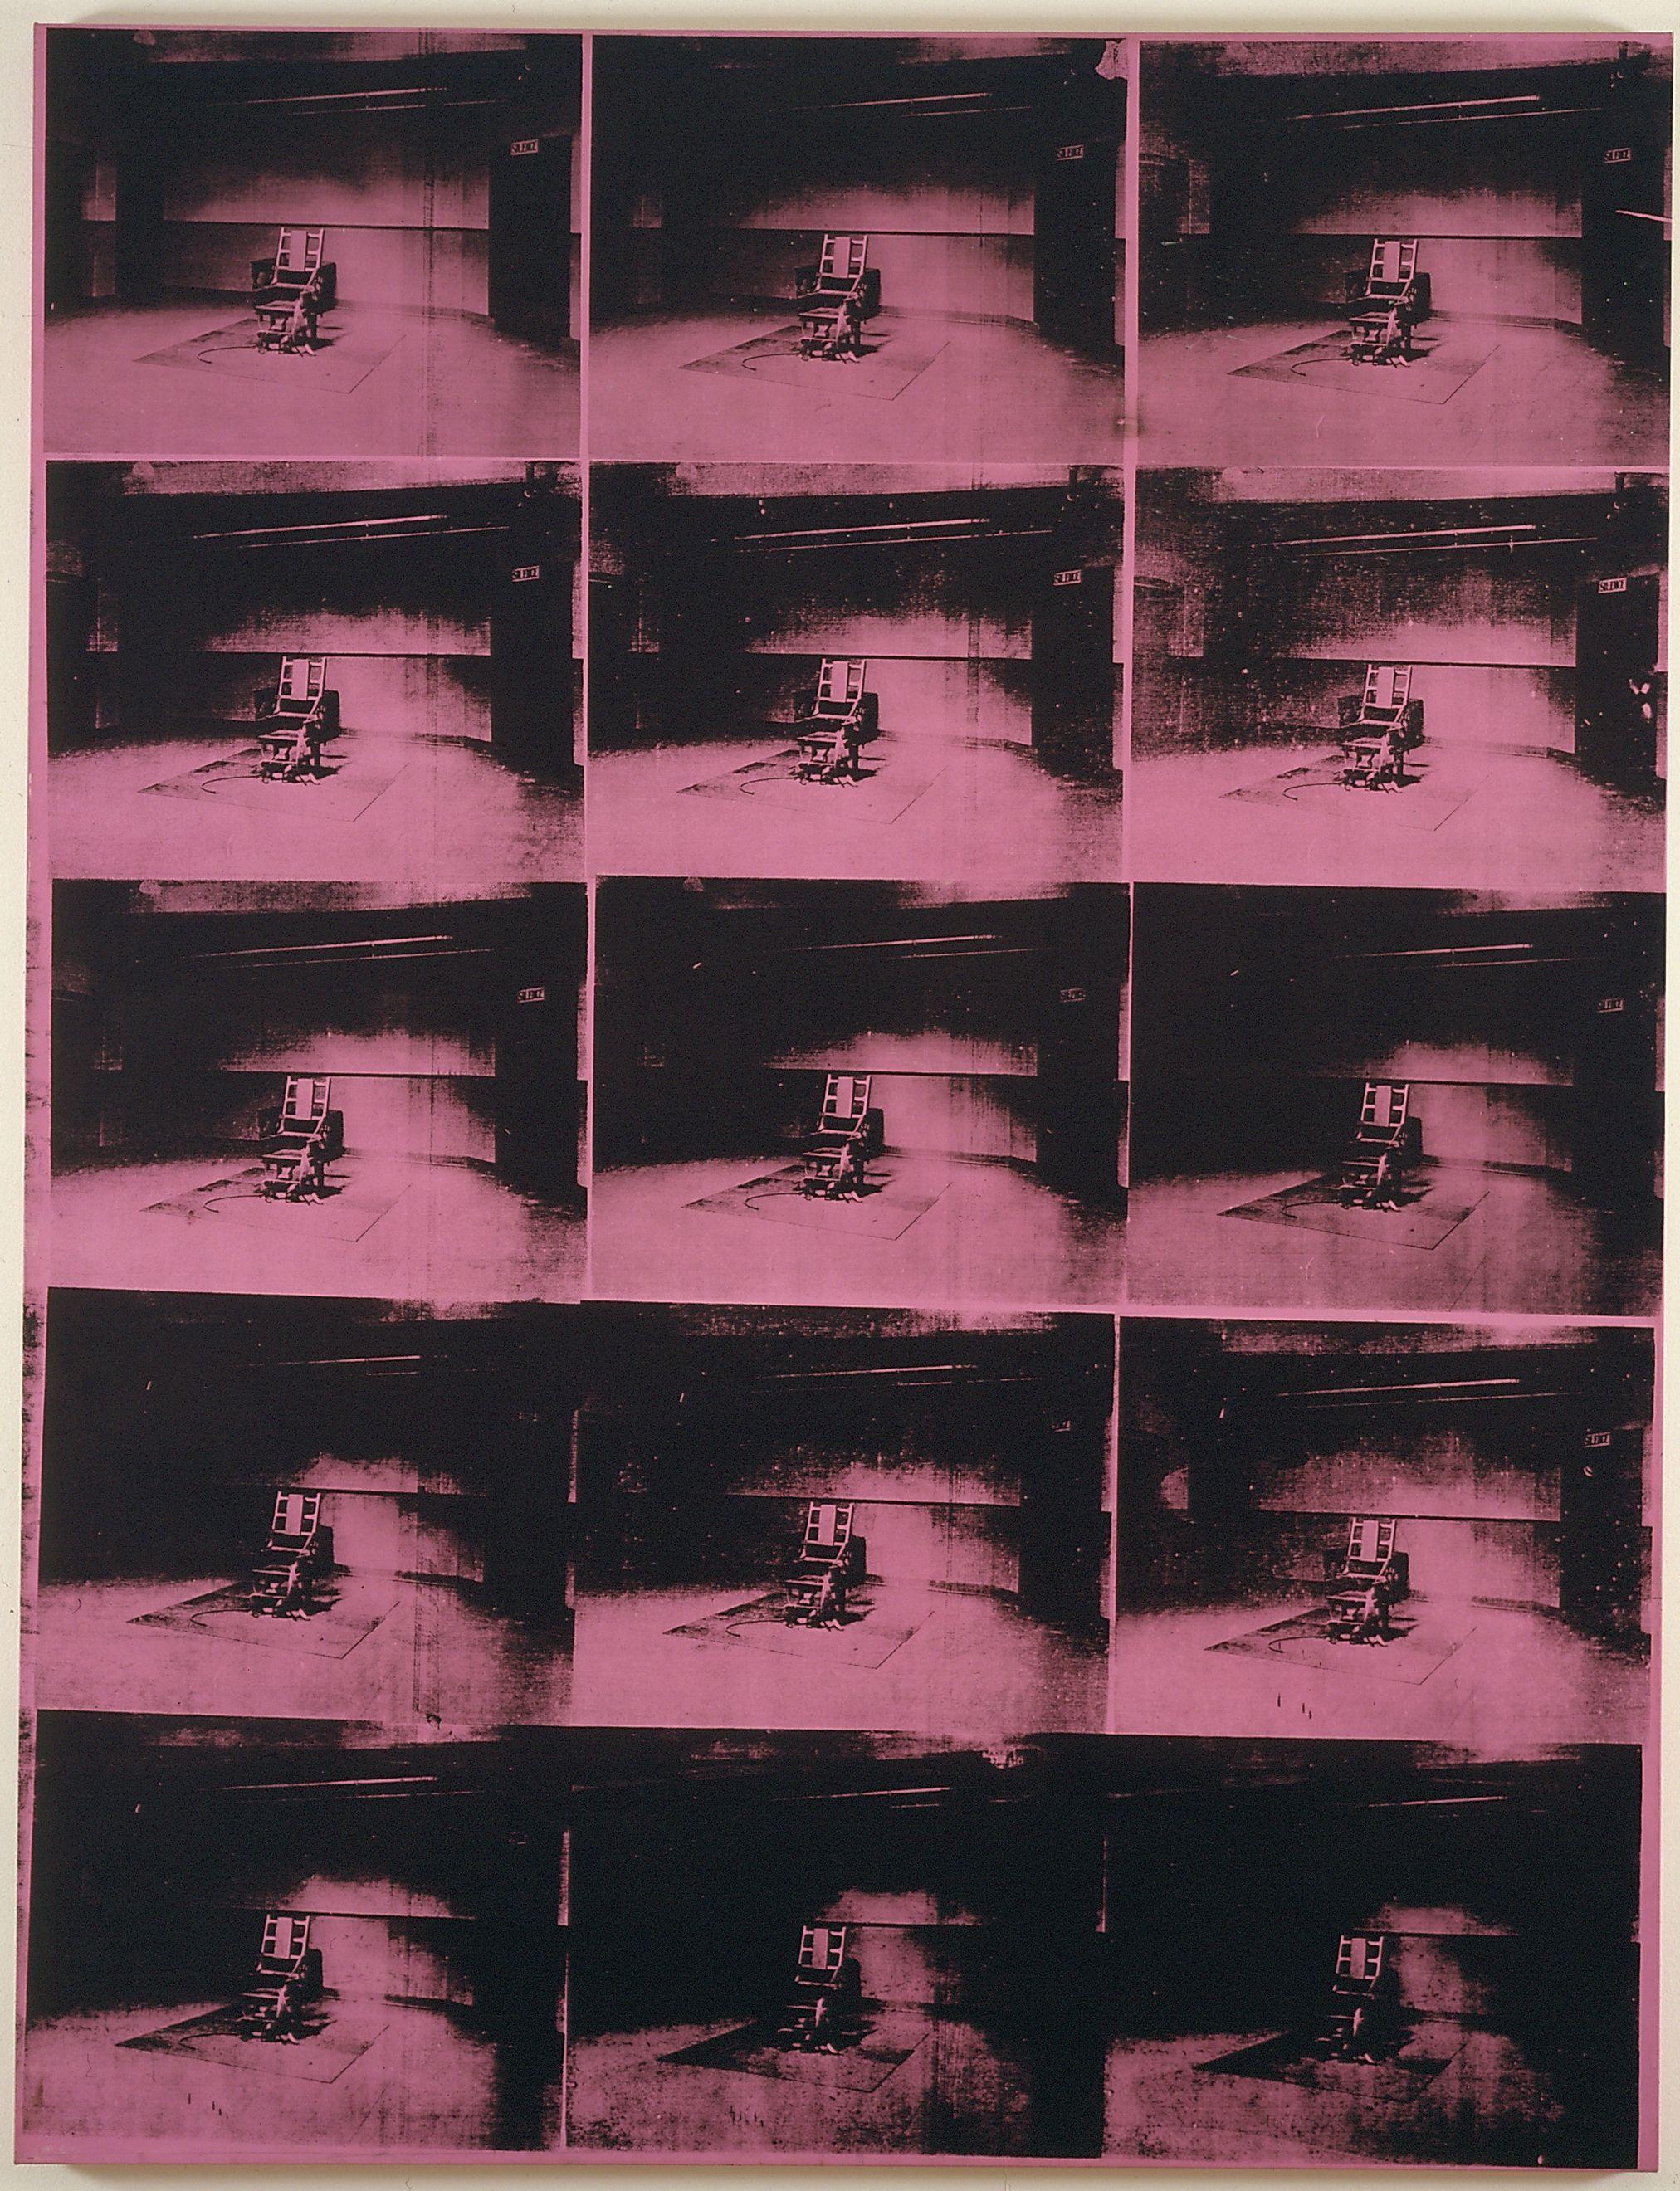 Andy Warhol, Lavender Disaster, 1963, Acrylic, silkscreen